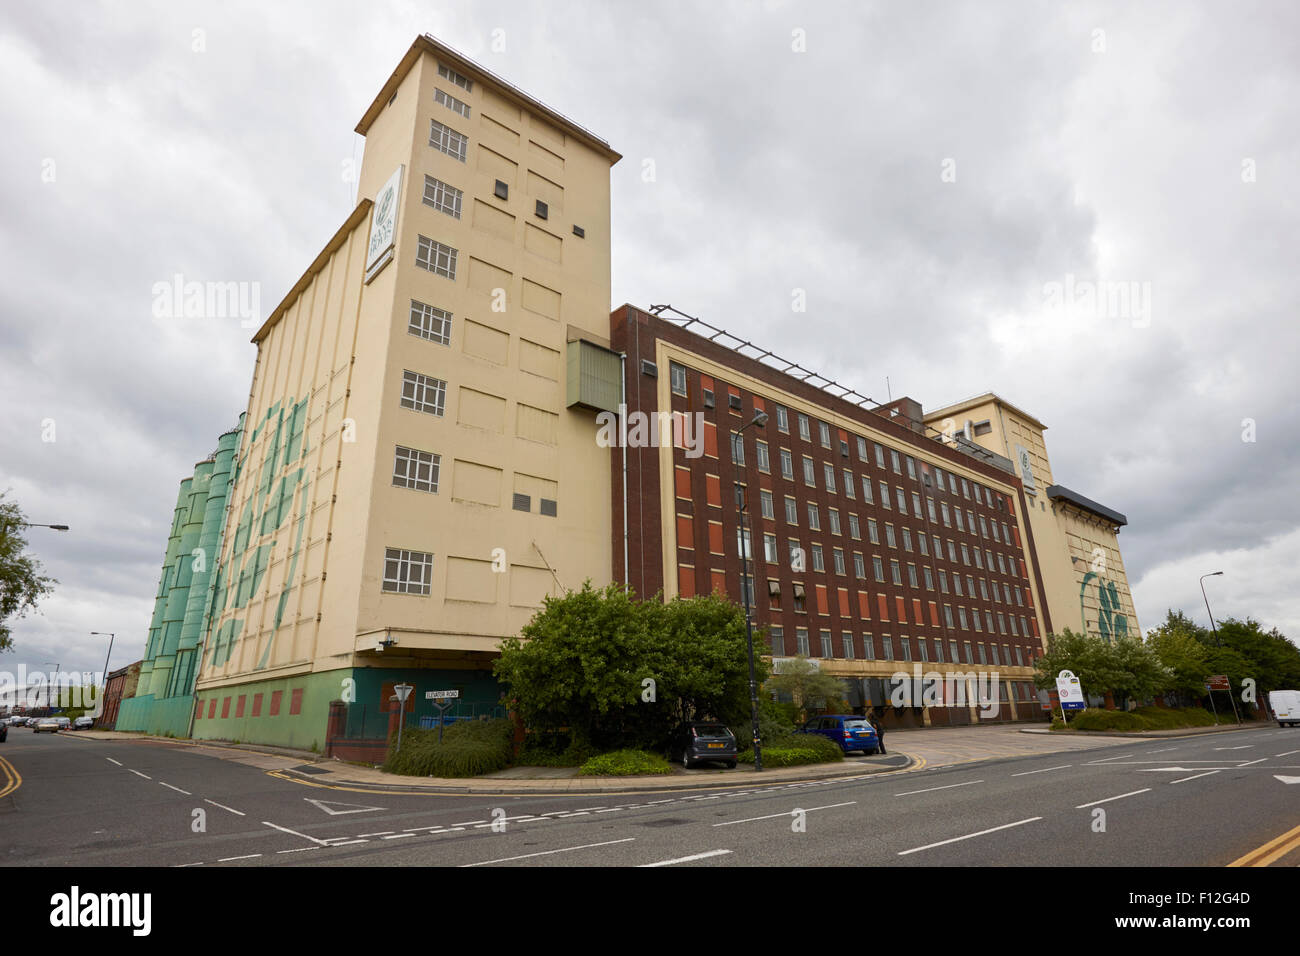 rank hovis flour mills salford Manchester uk Stock Photo